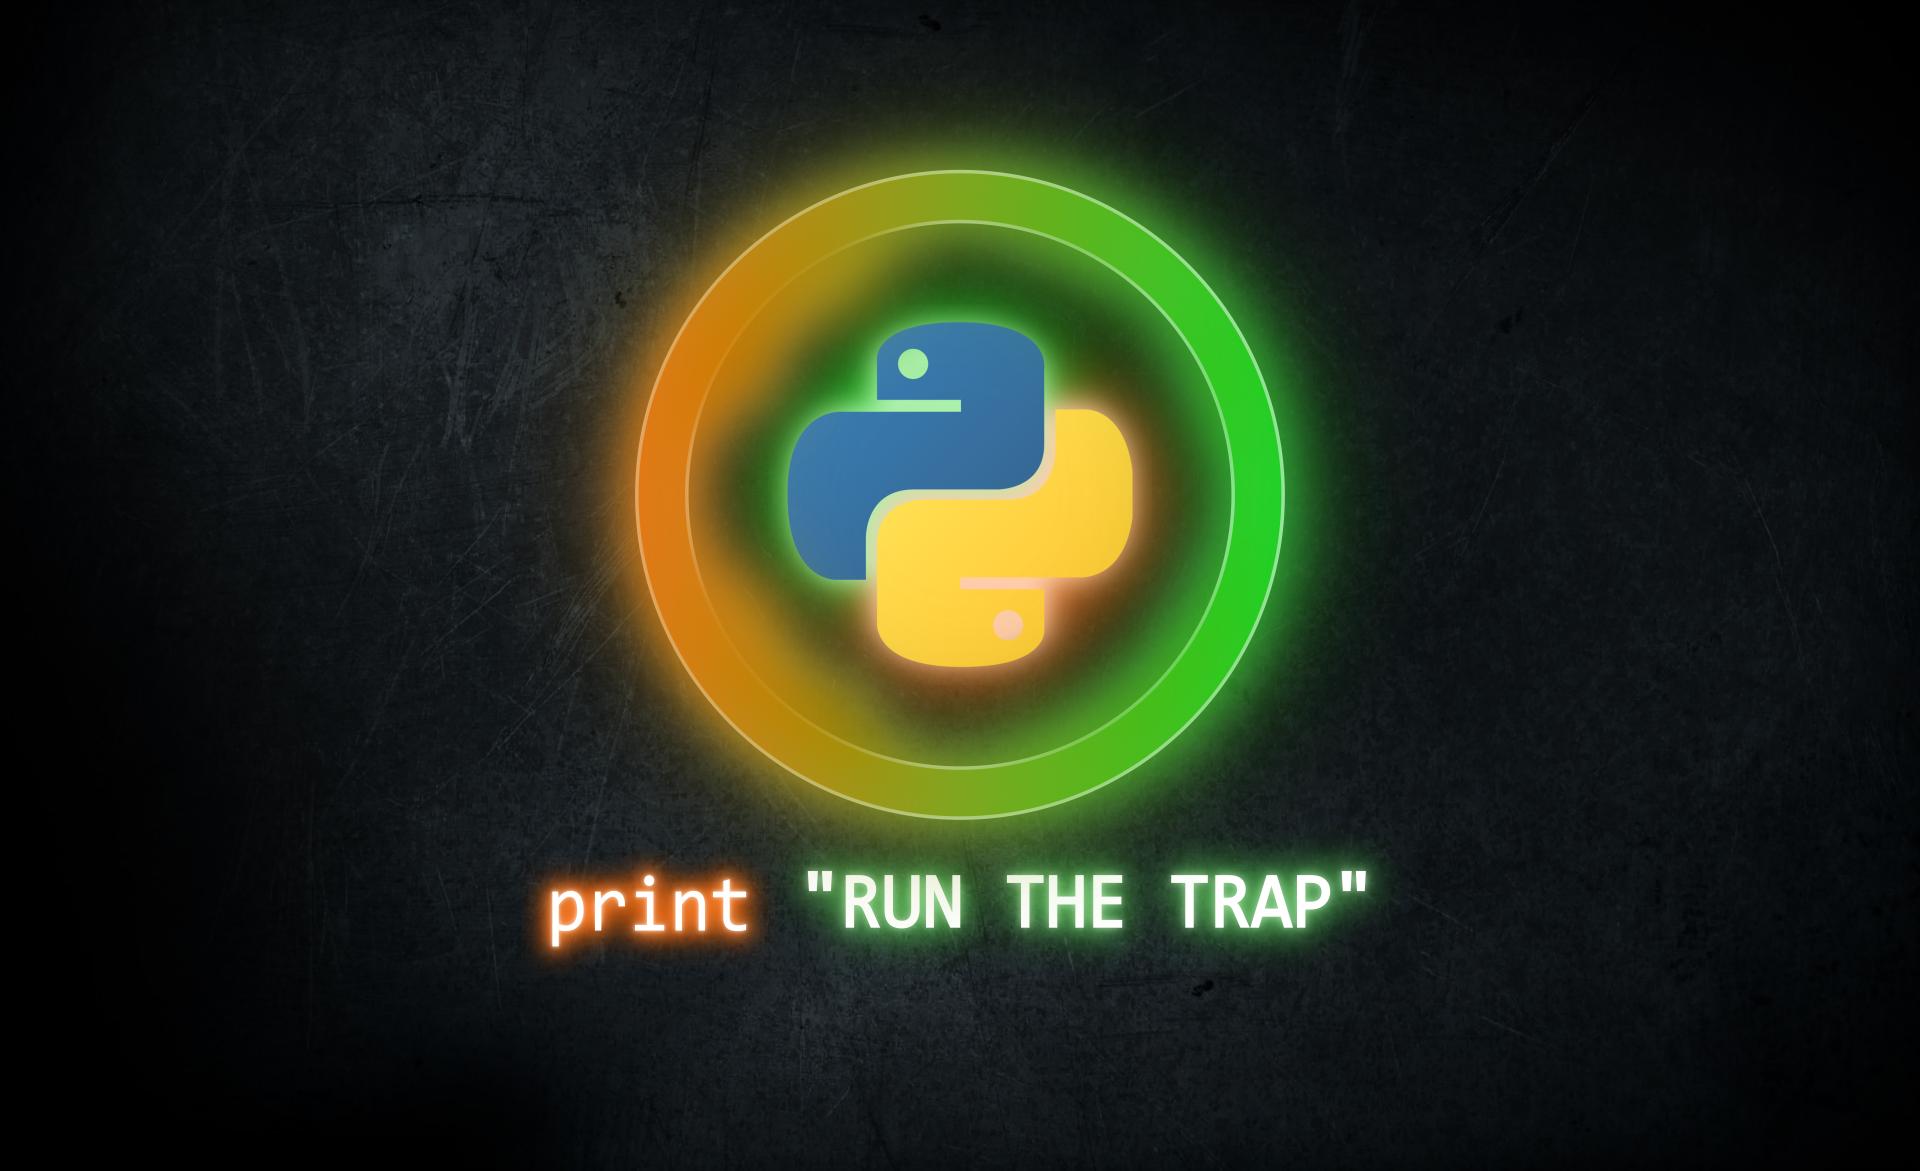 Python Run The Trap 8k Ultra Hd Wallpaper Background Image